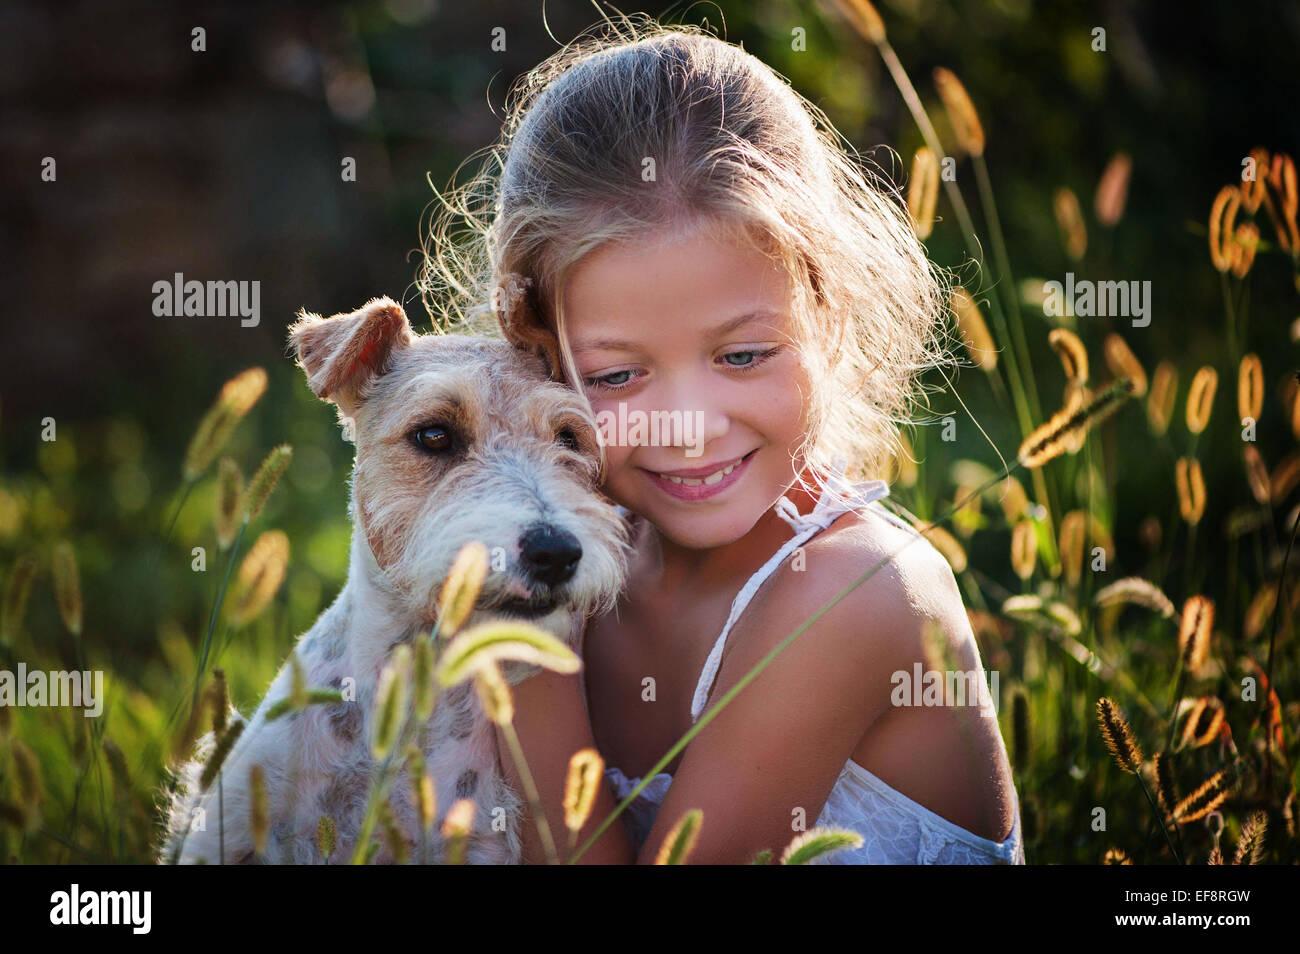 Portrait of Girl (6-7) embracing dog Photo Stock